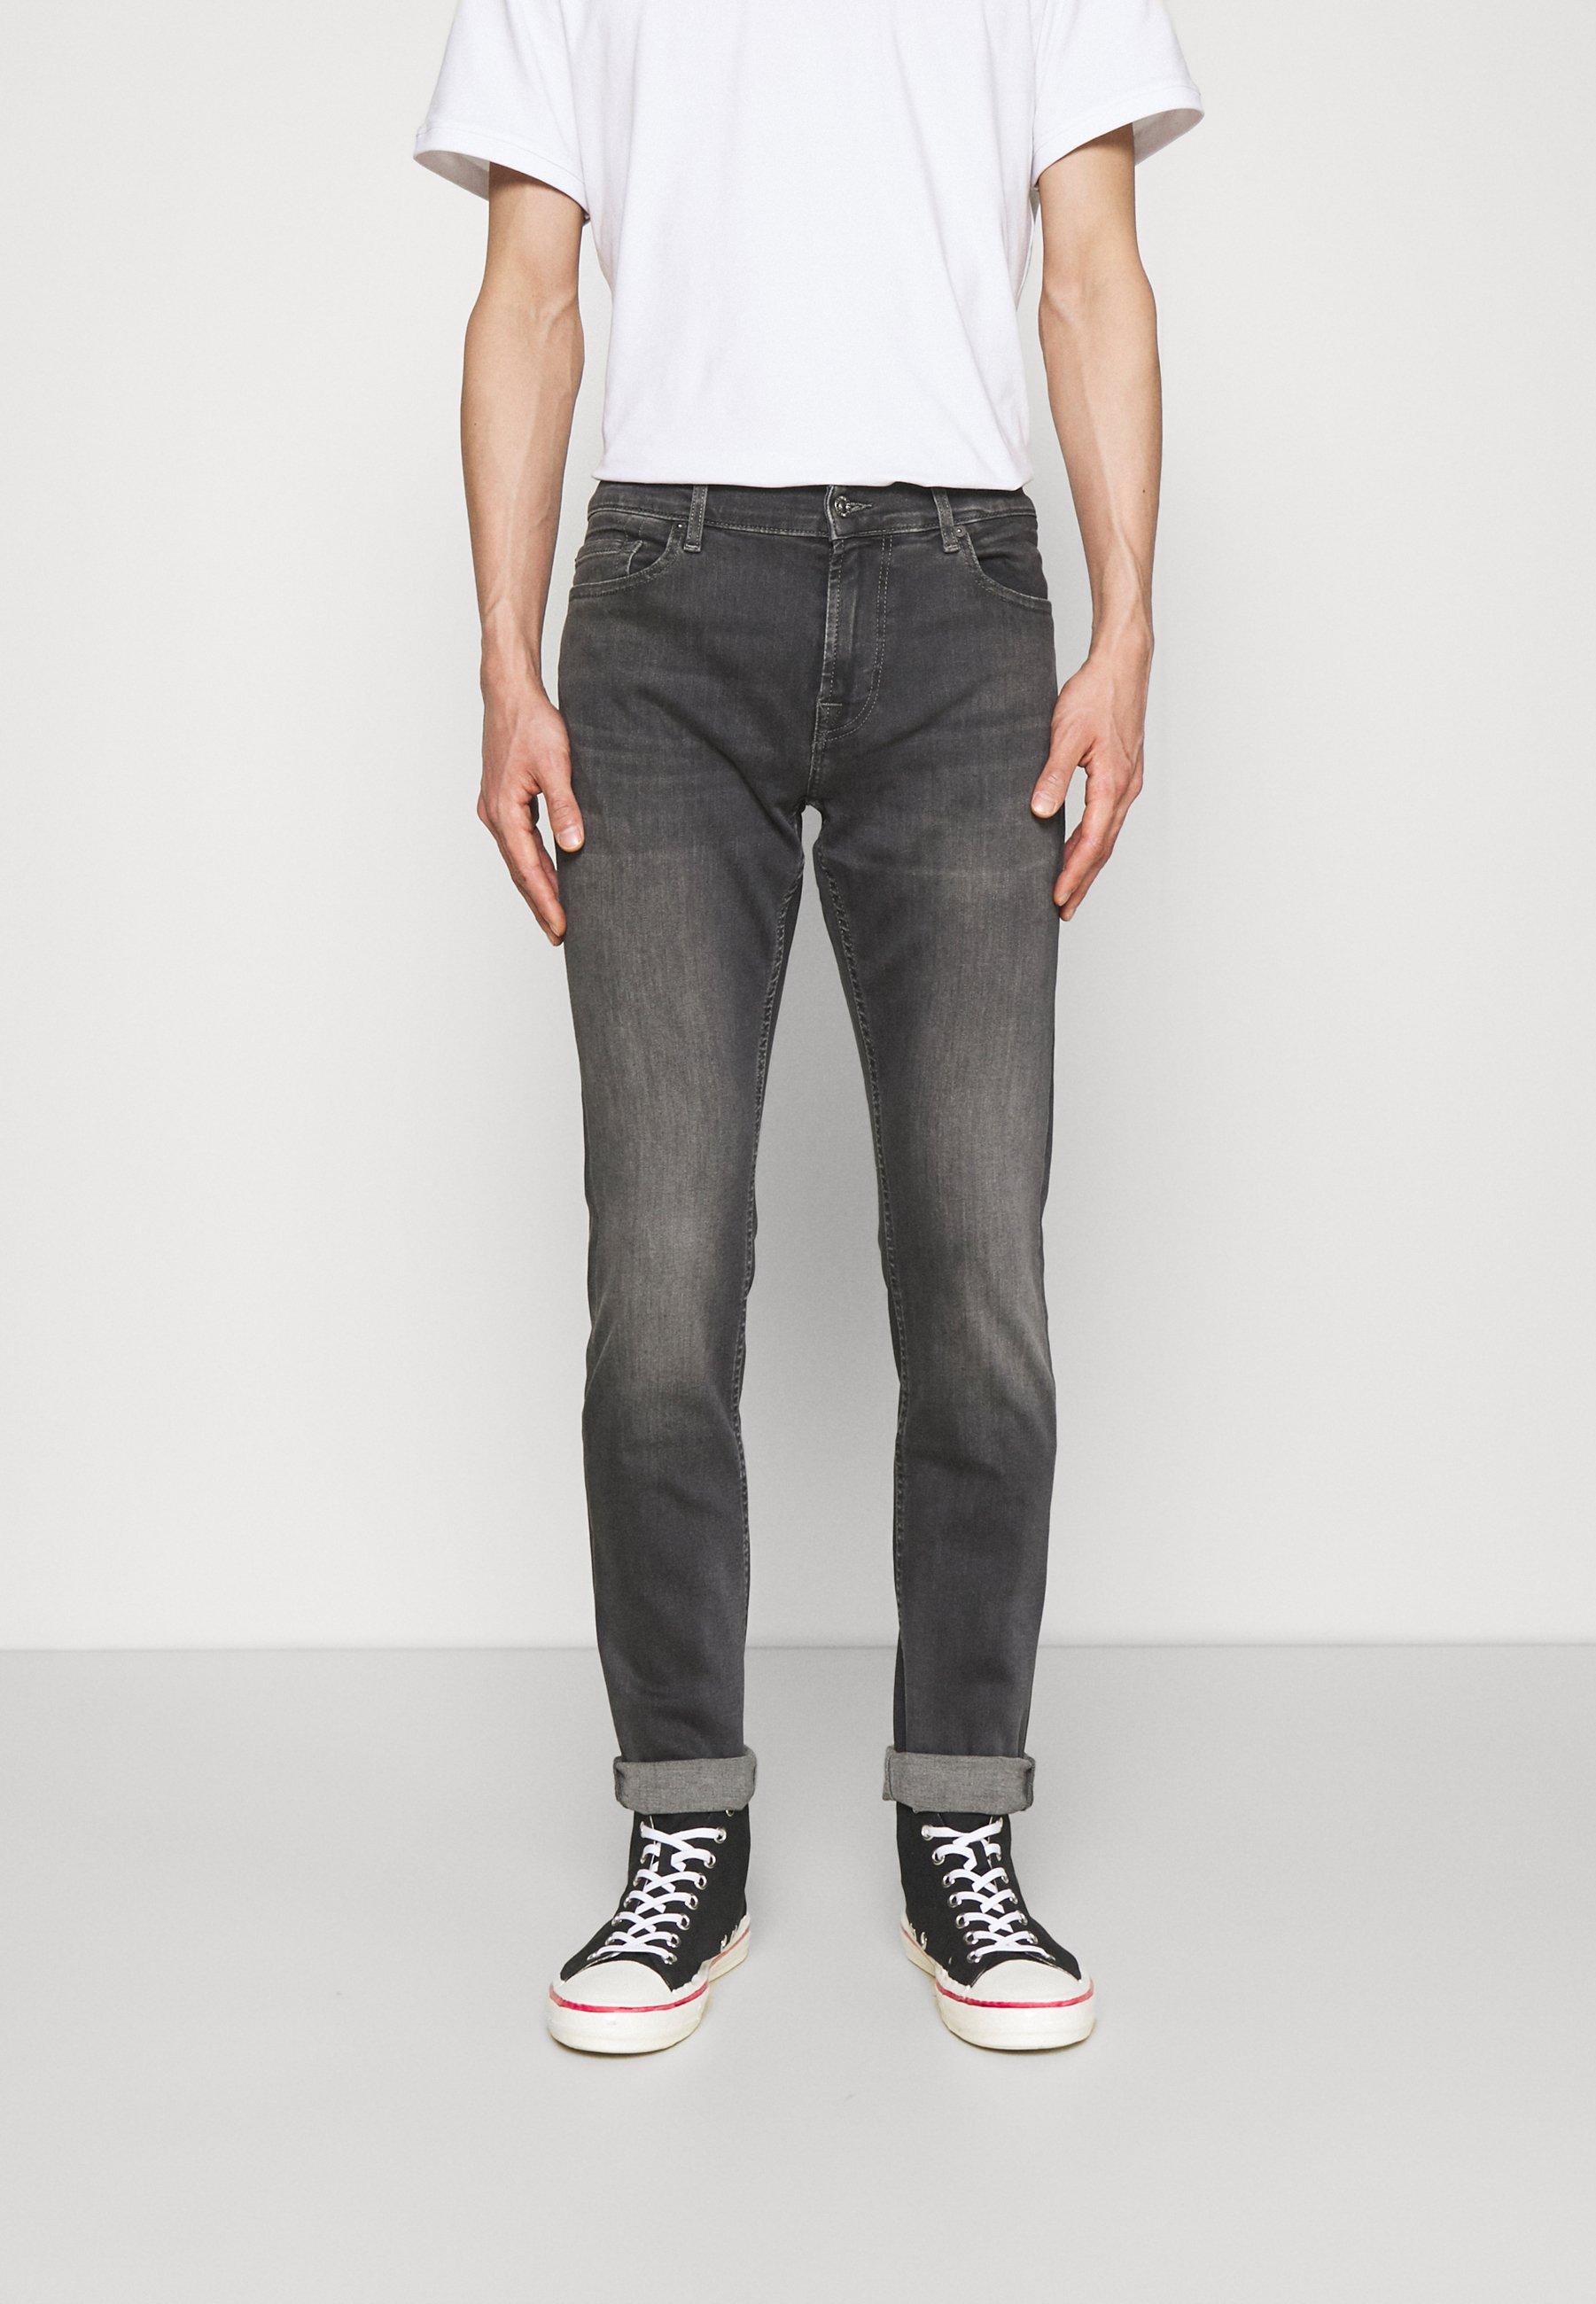 Uomo RONNIE LEGEND - Jeans slim fit